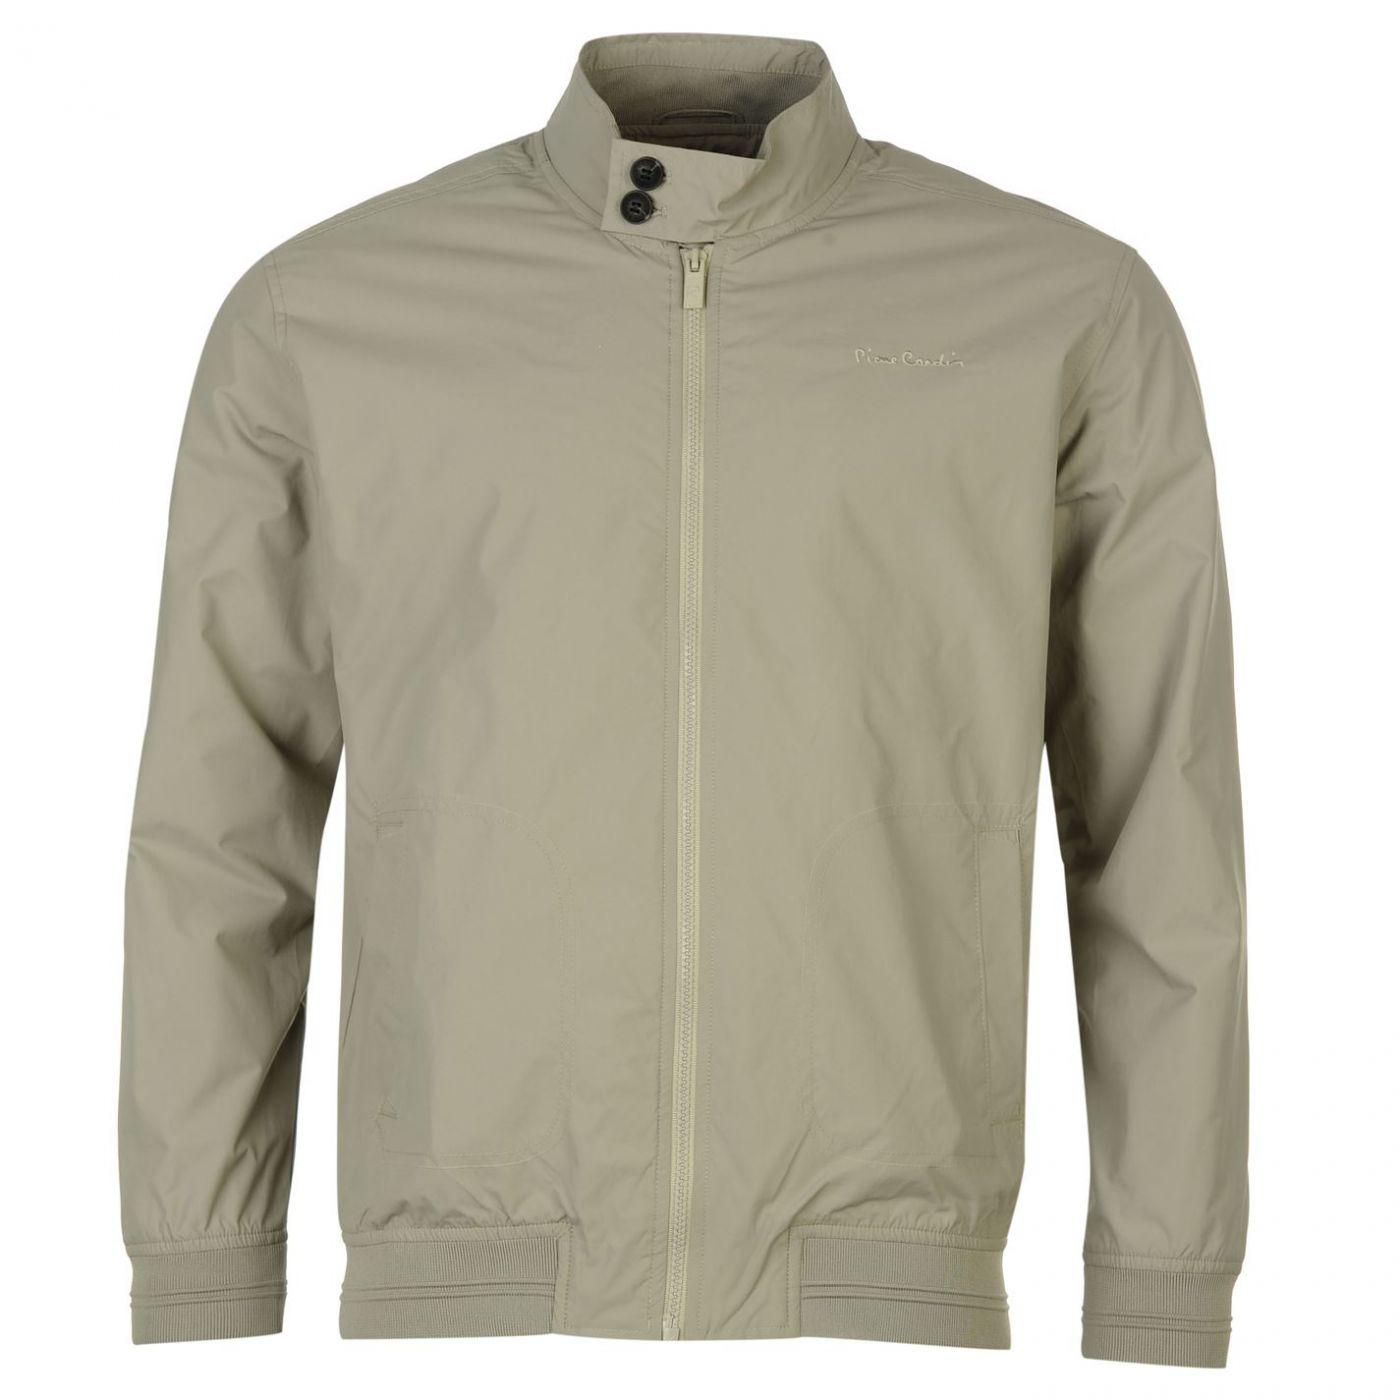 8b6be0607 Pierre Cardin Harrington Jacket Mens - FACTCOOL